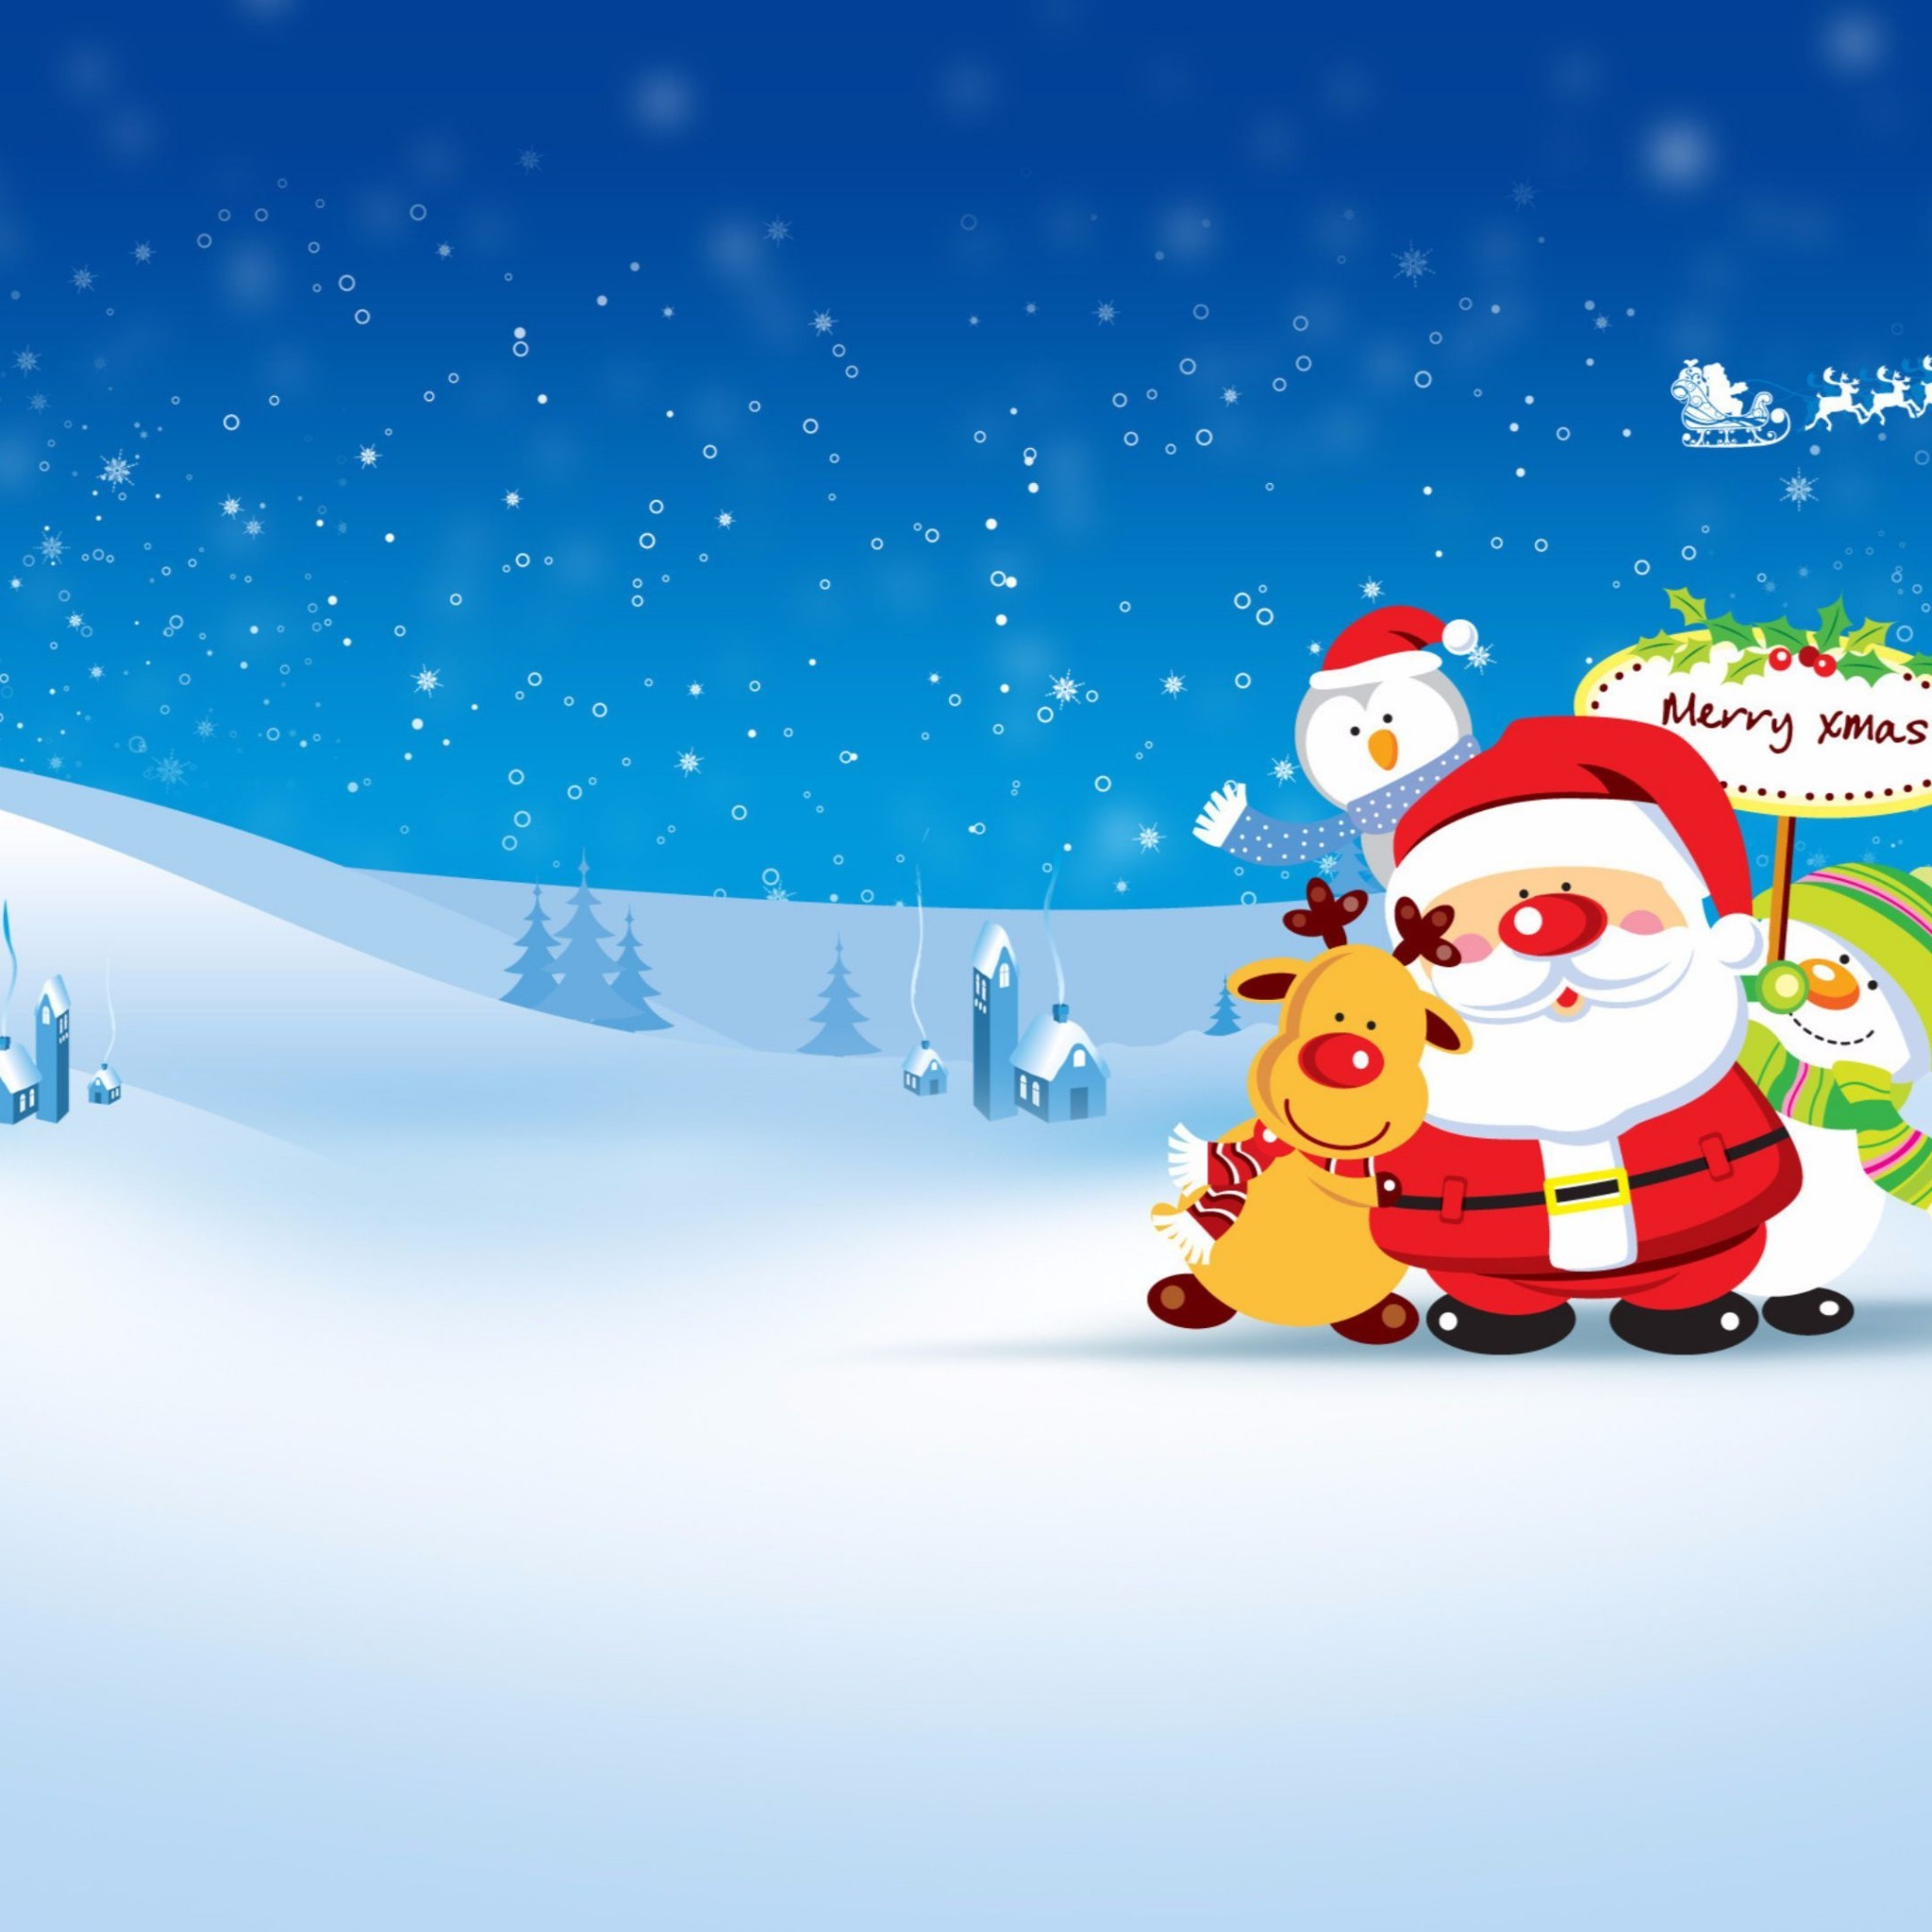 Related to Cartoon Santa 2016 Merry Christmas 4K Wallpaper